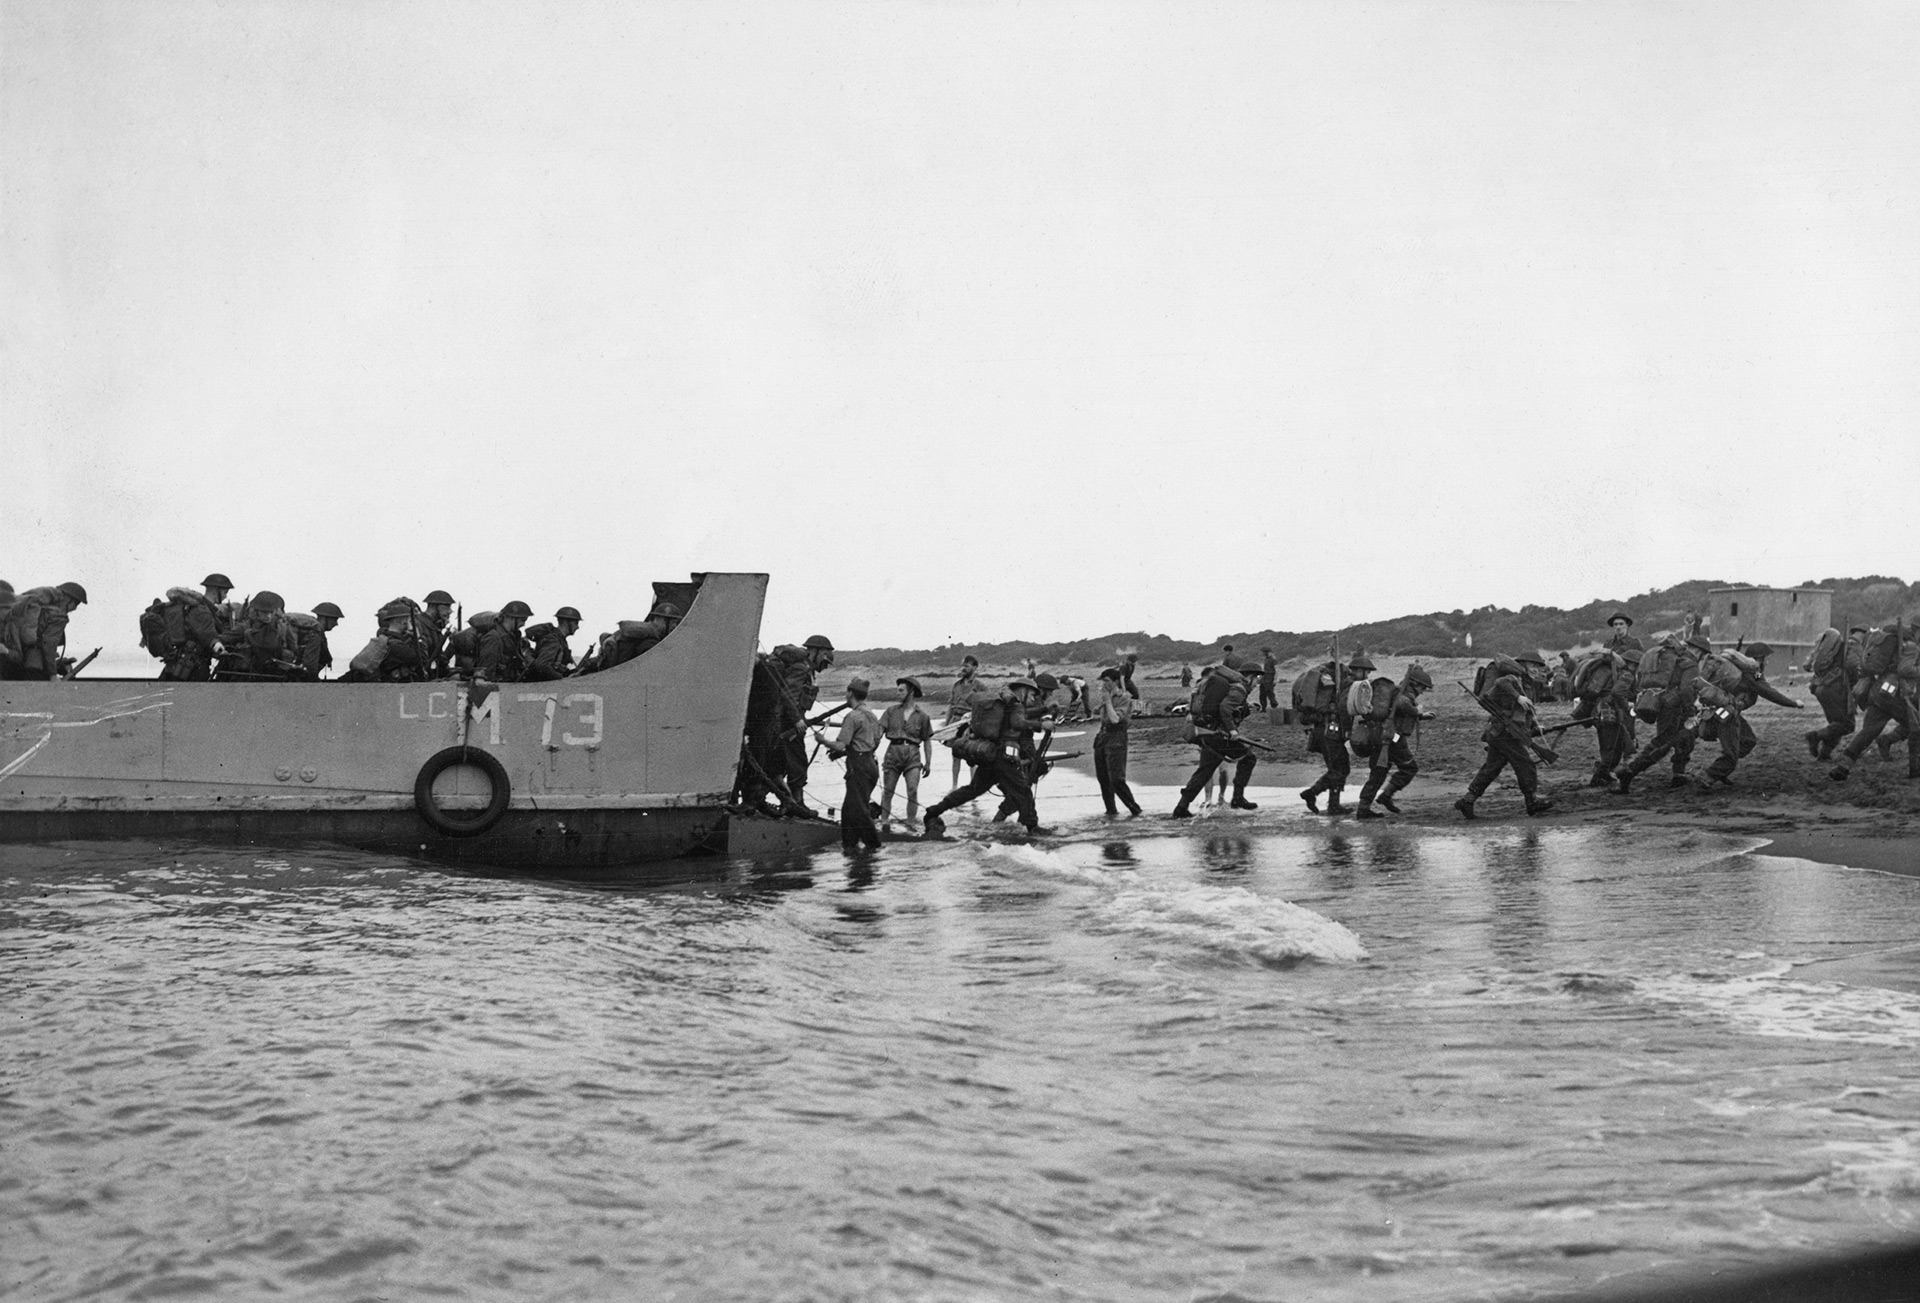 Tropas británicas desembarcan en Algiers, Argelia (Keystone/Hulton Archive/Getty Images)